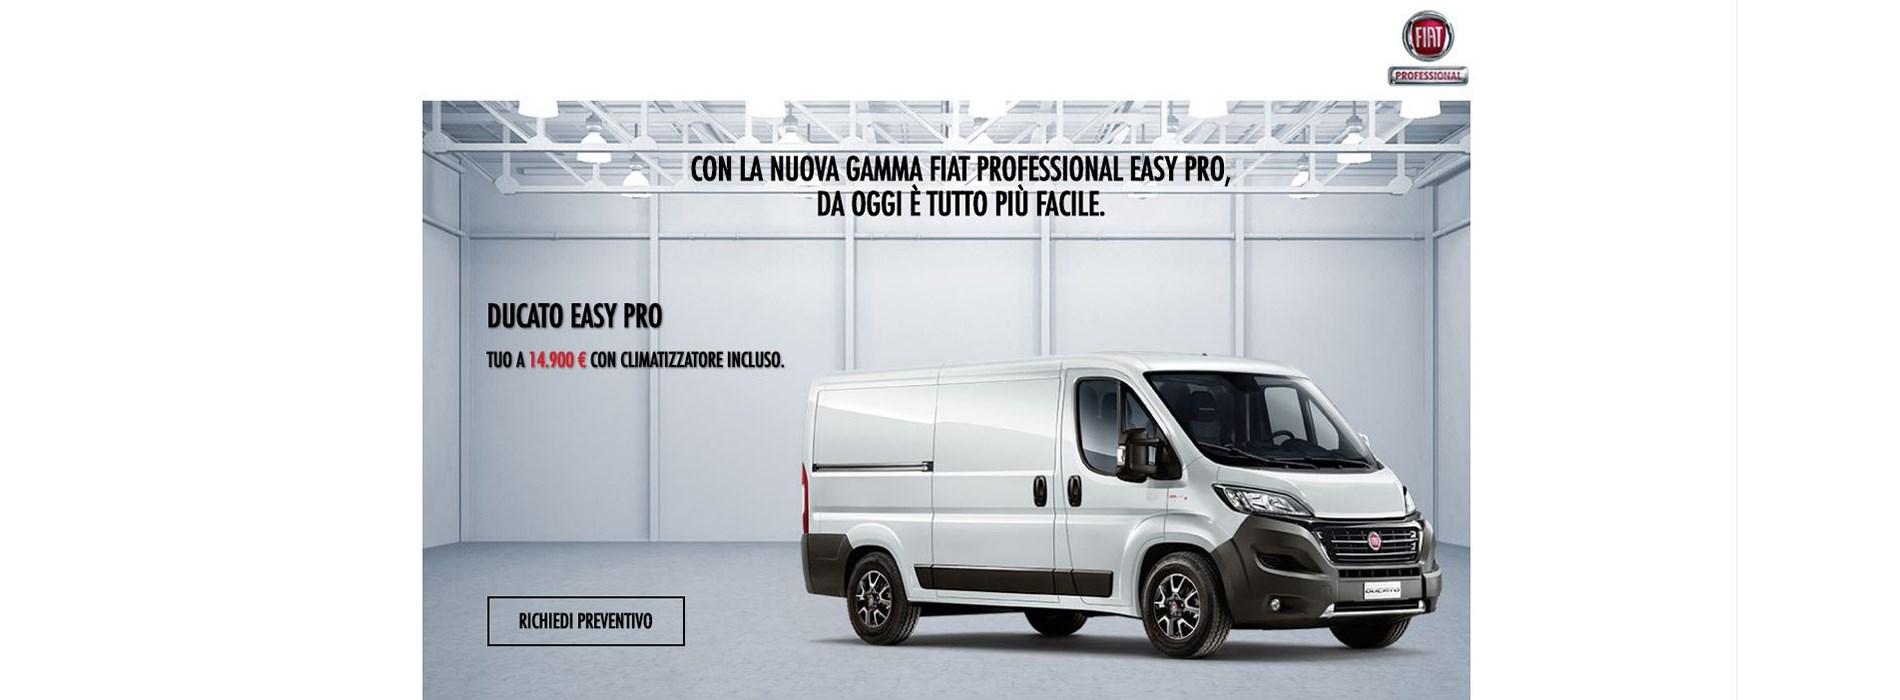 mirafiori-motor-village-concessionaria-fiat-professional-offerta